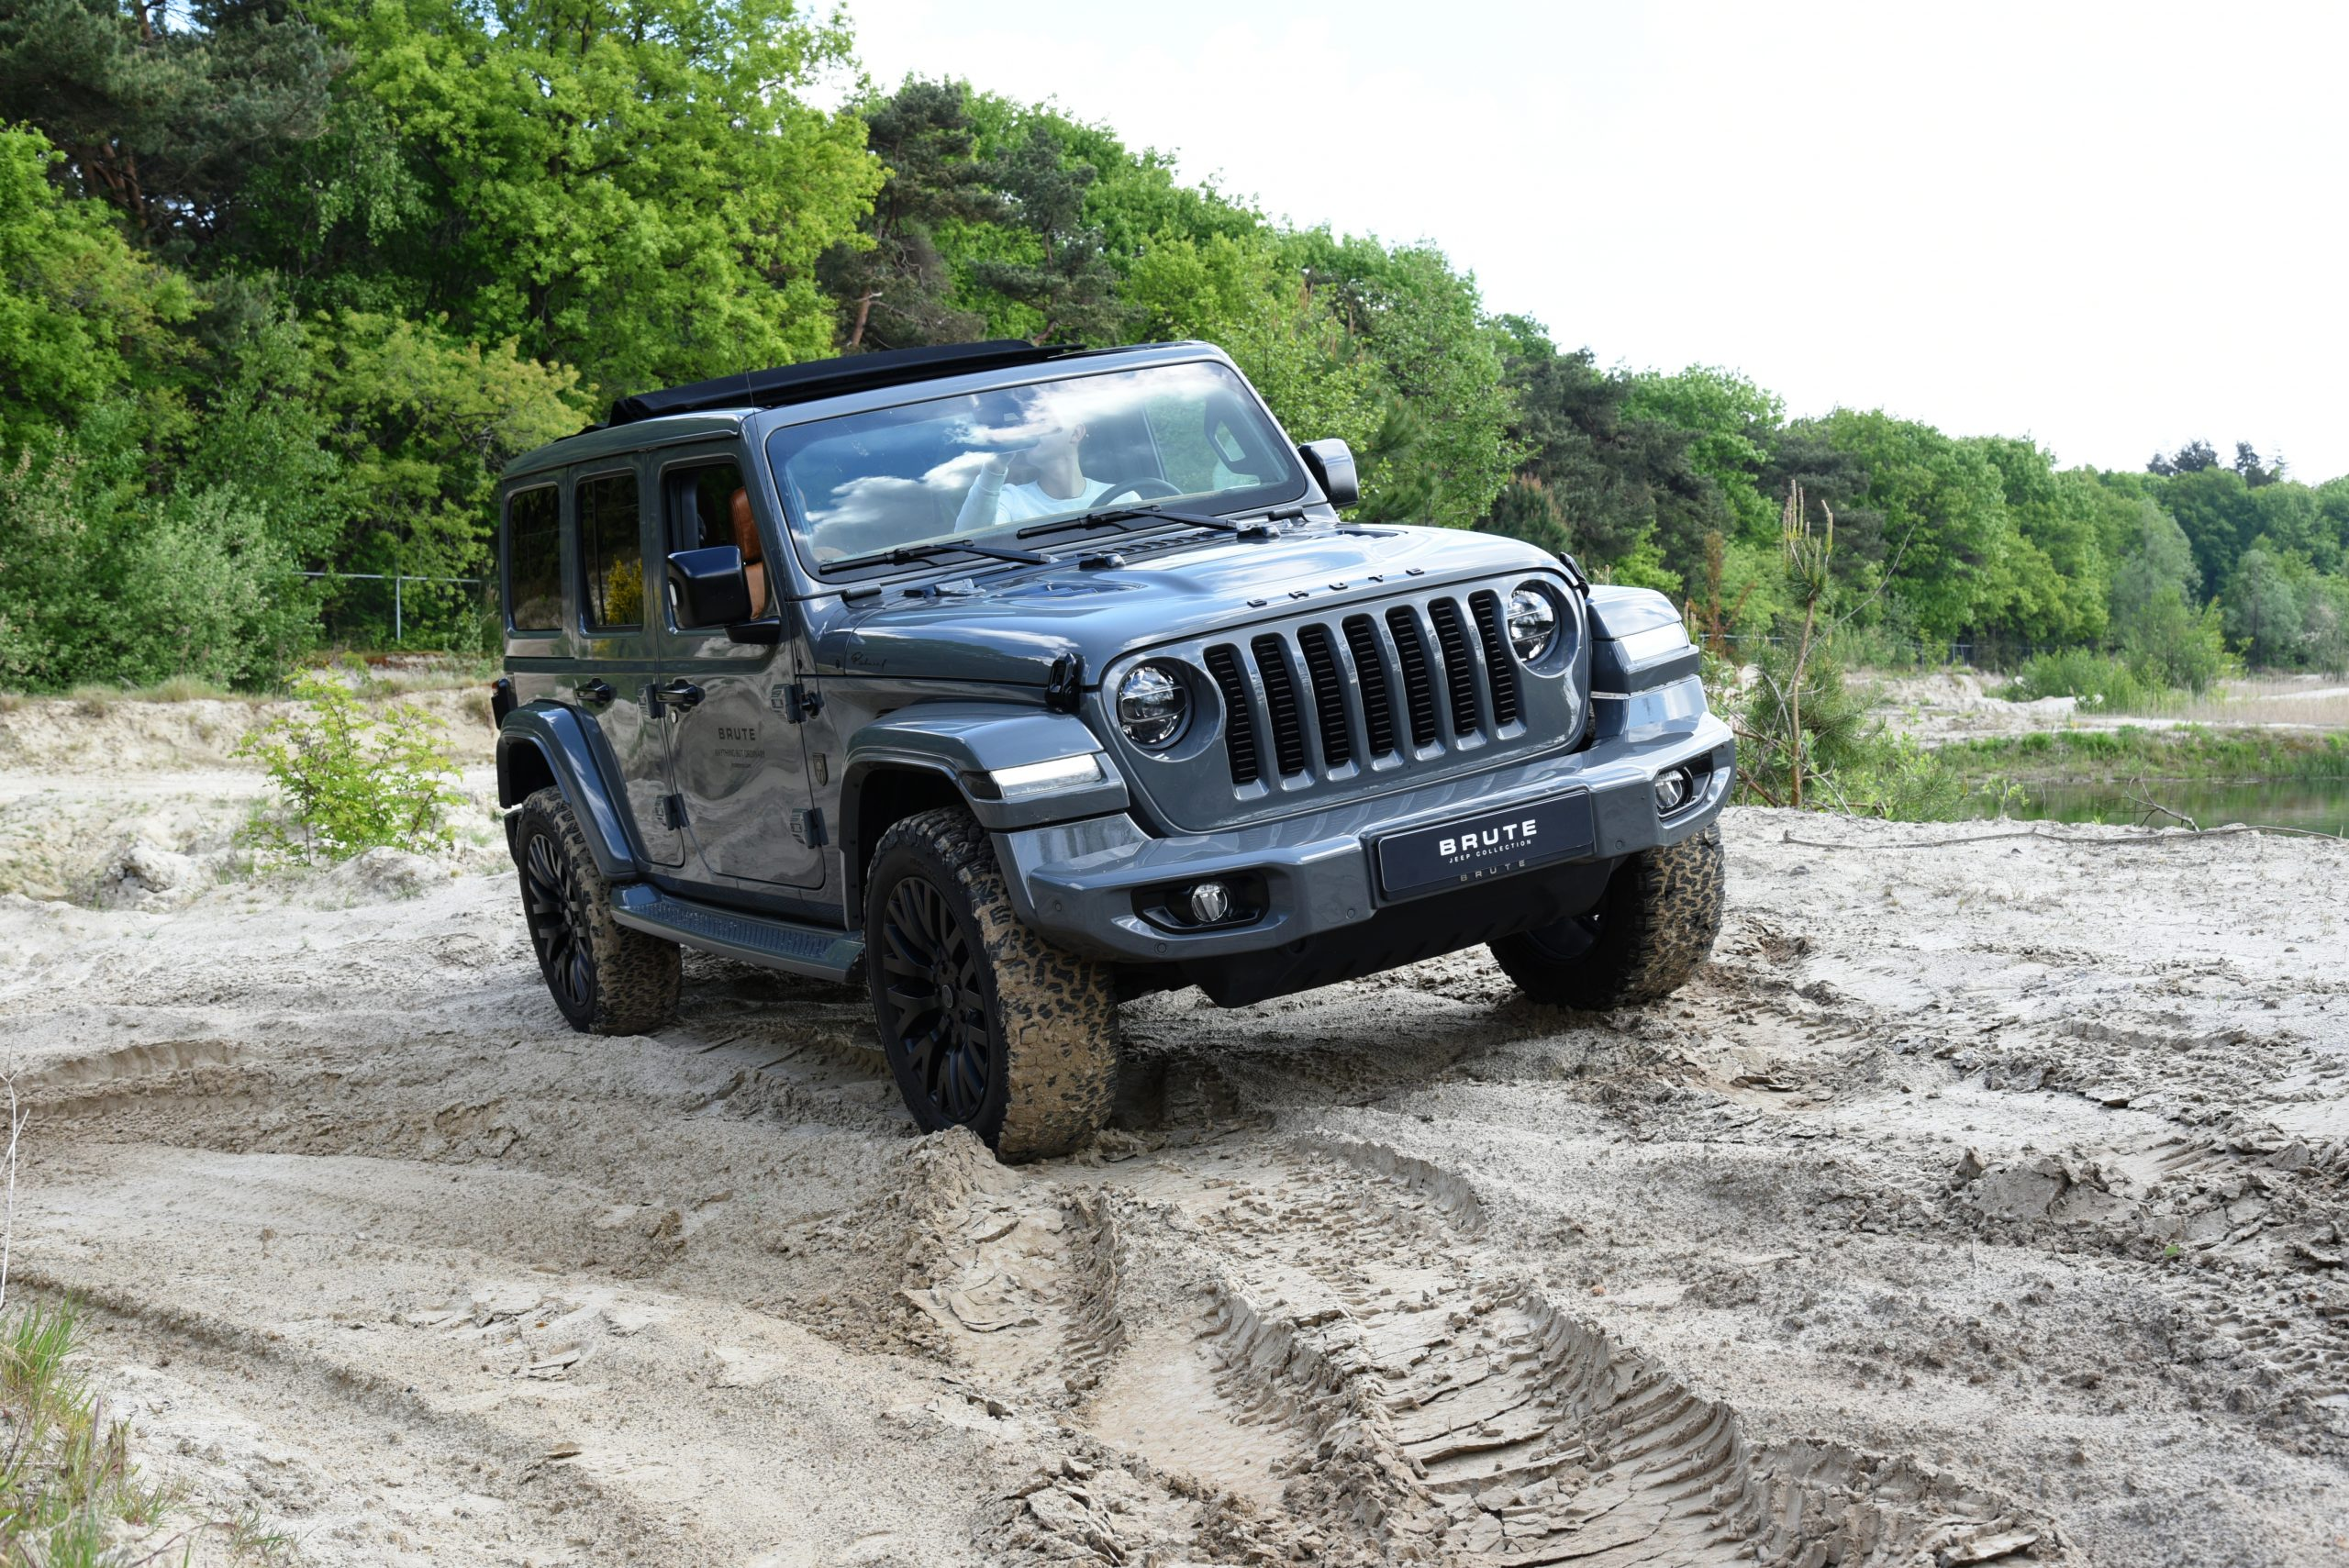 Gereden Brute Richmond Jeep Wrangler Off Road Hartvoorautos Nl